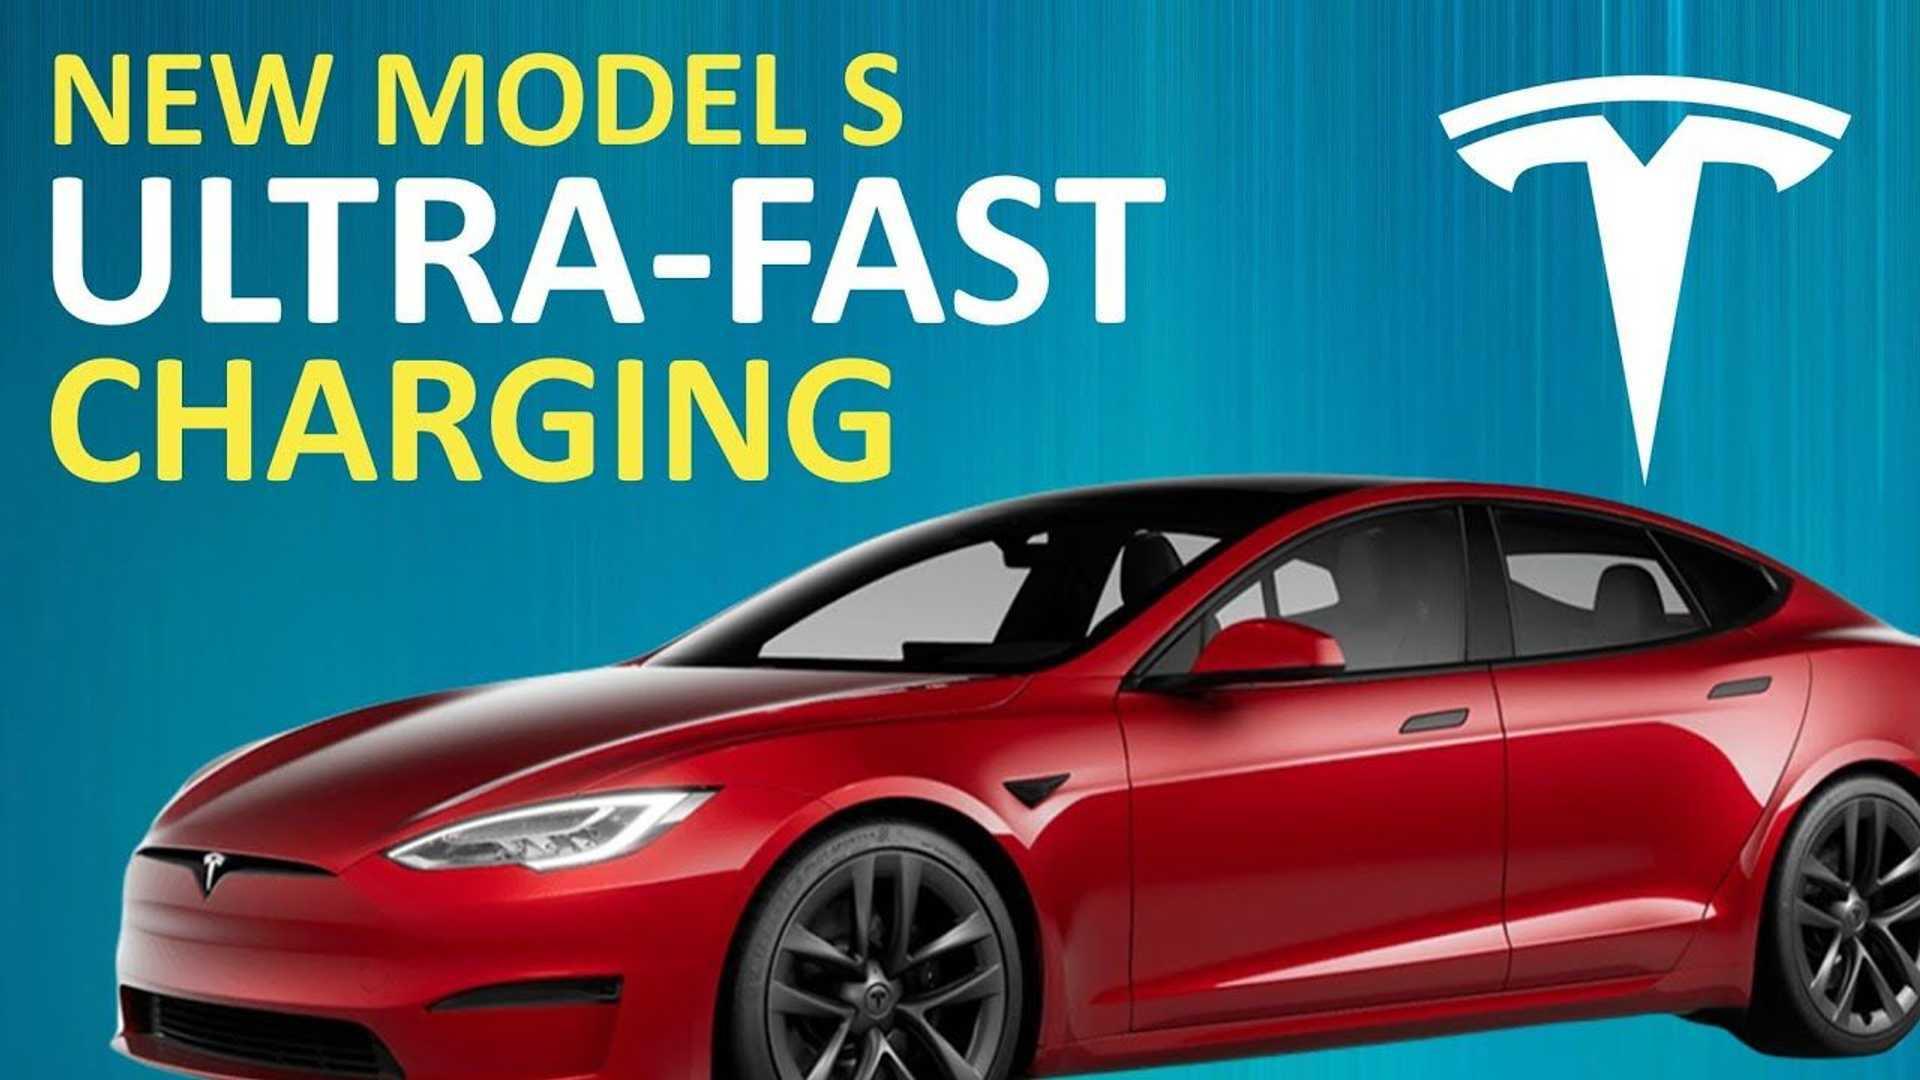 Tesla Model S Plaid Charging At 936 MPH: Can Rivals Beat It?